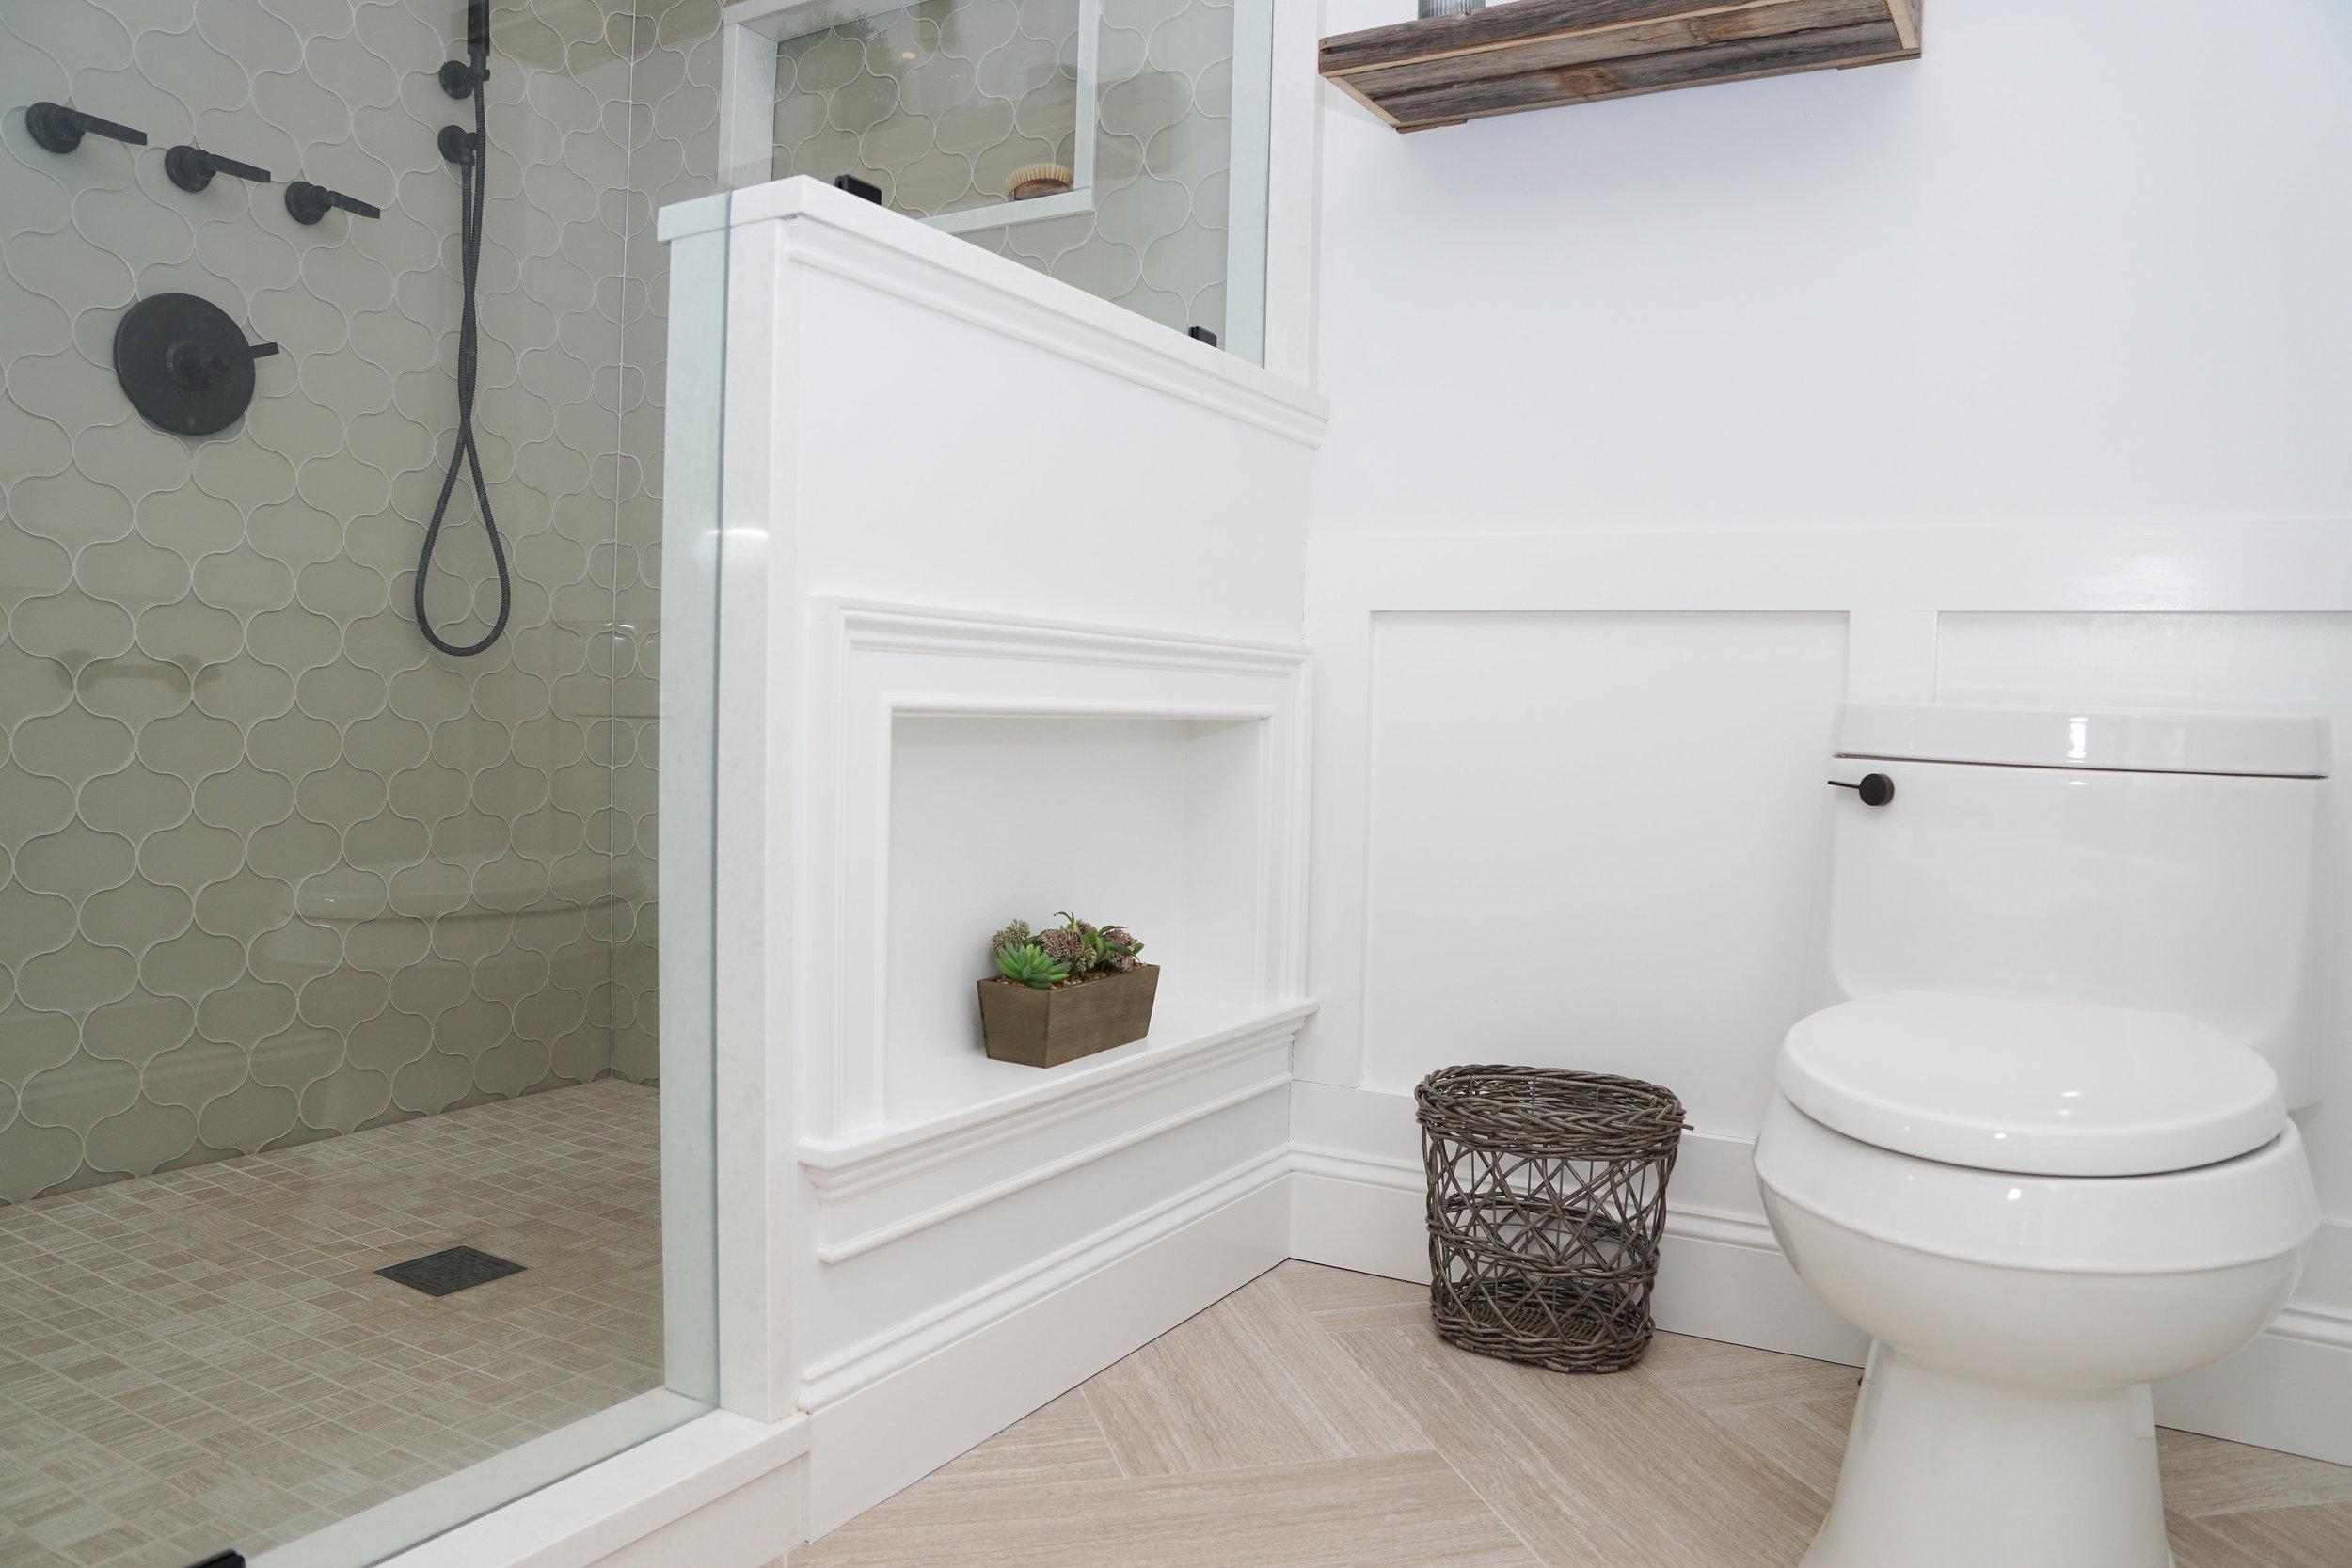 Built-in shelf in master bath